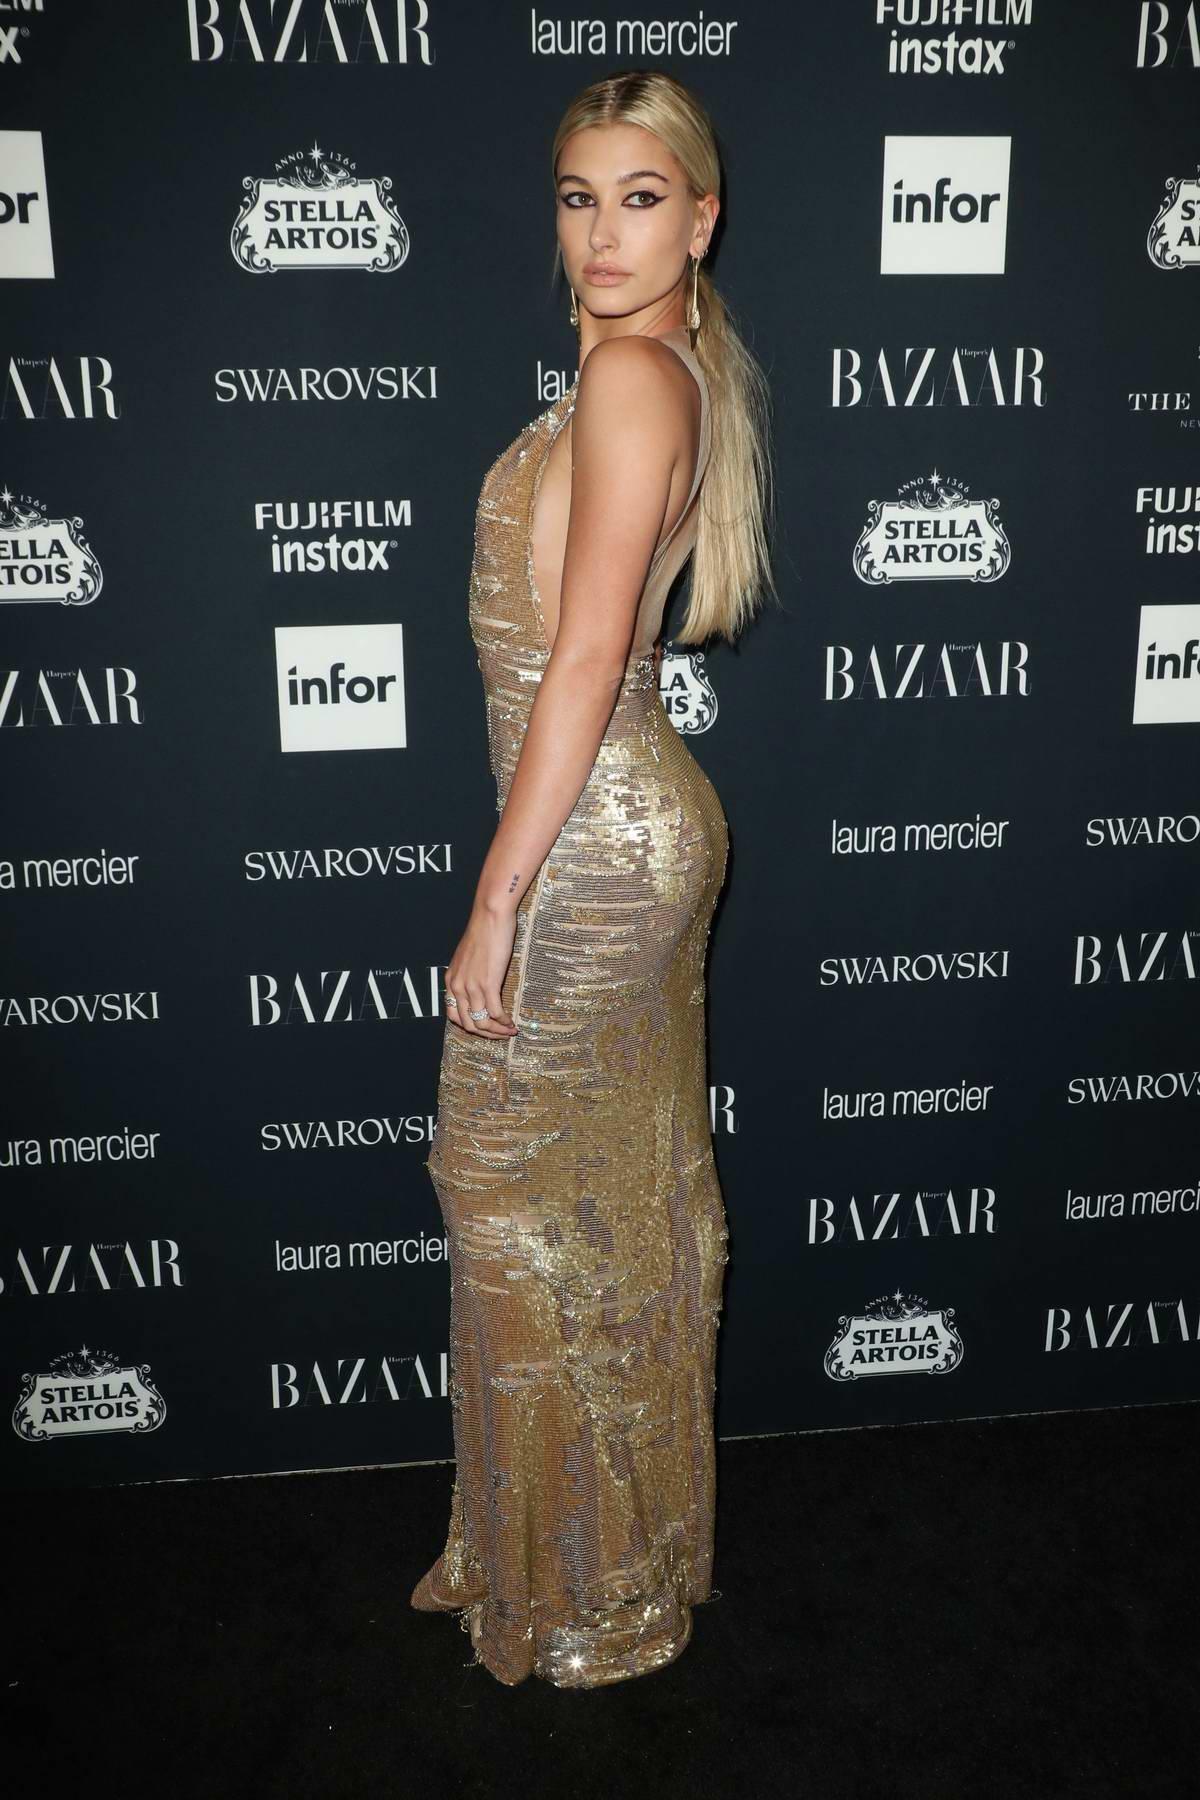 Hailey Baldwin at the Harper's Bazaar ICONS party at New York Fashion Week